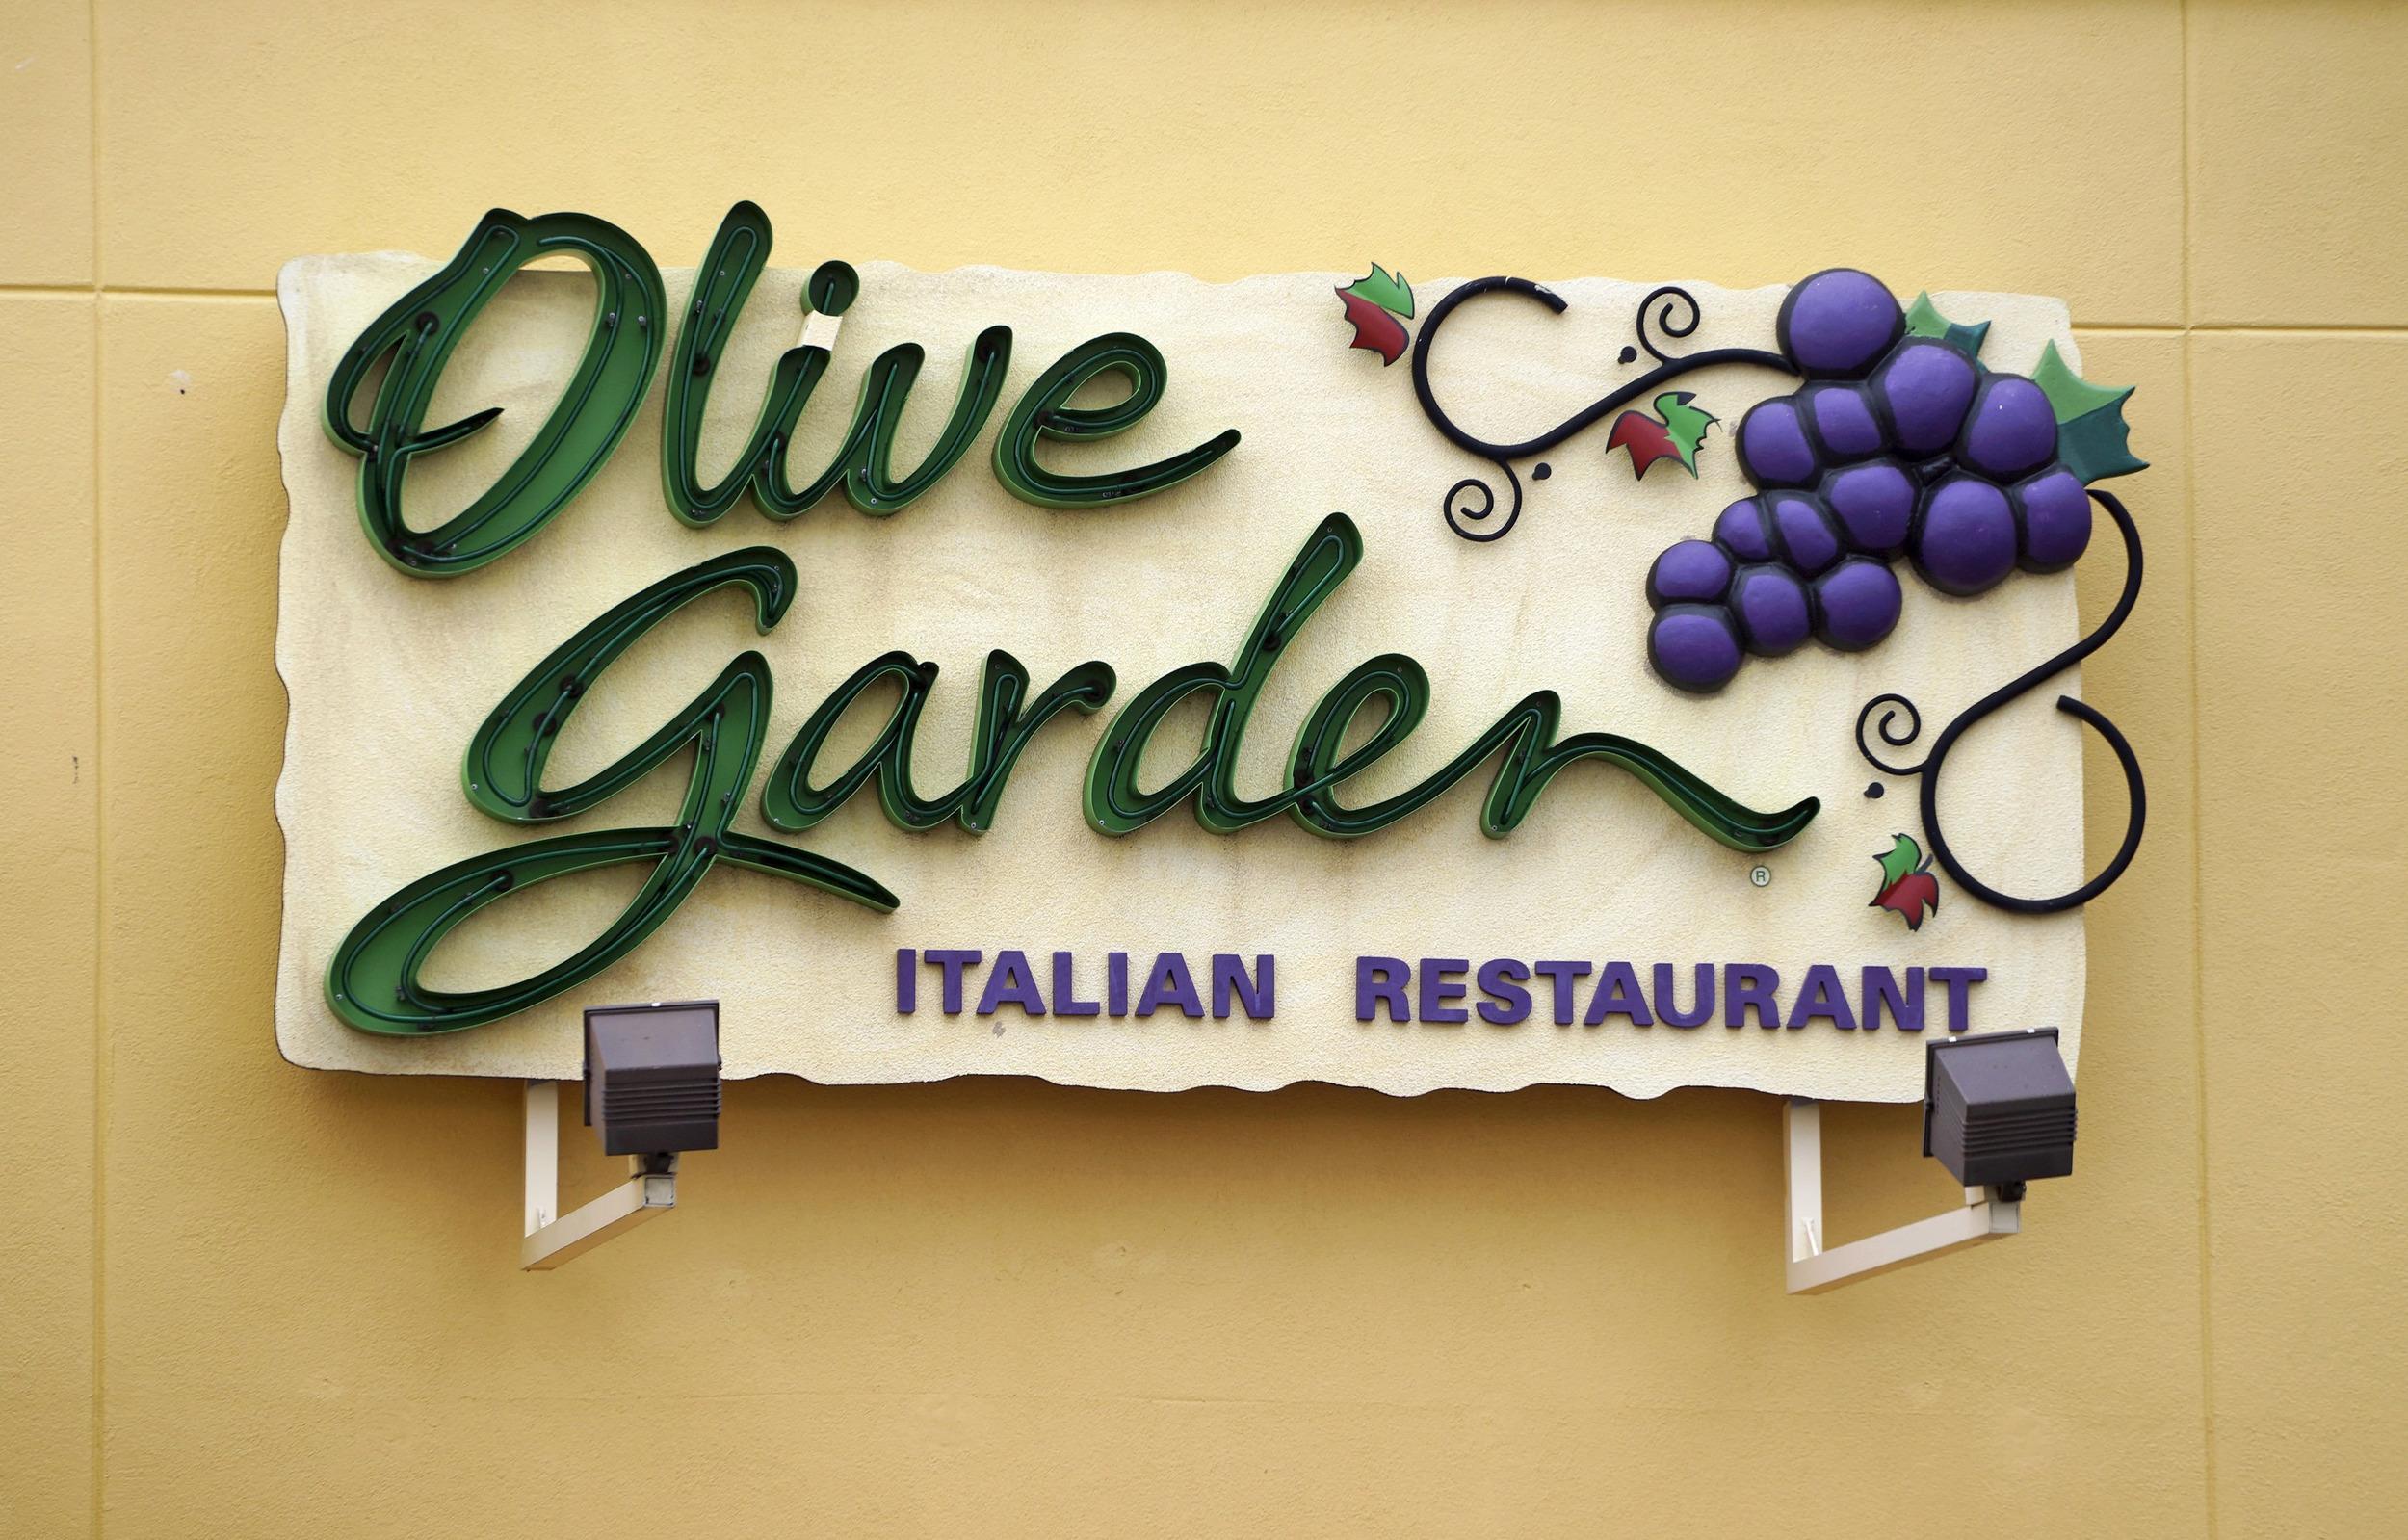 Olive Garden 39 S Latest Plan 39 Breadstick Sandwiches 39 15 Minute News